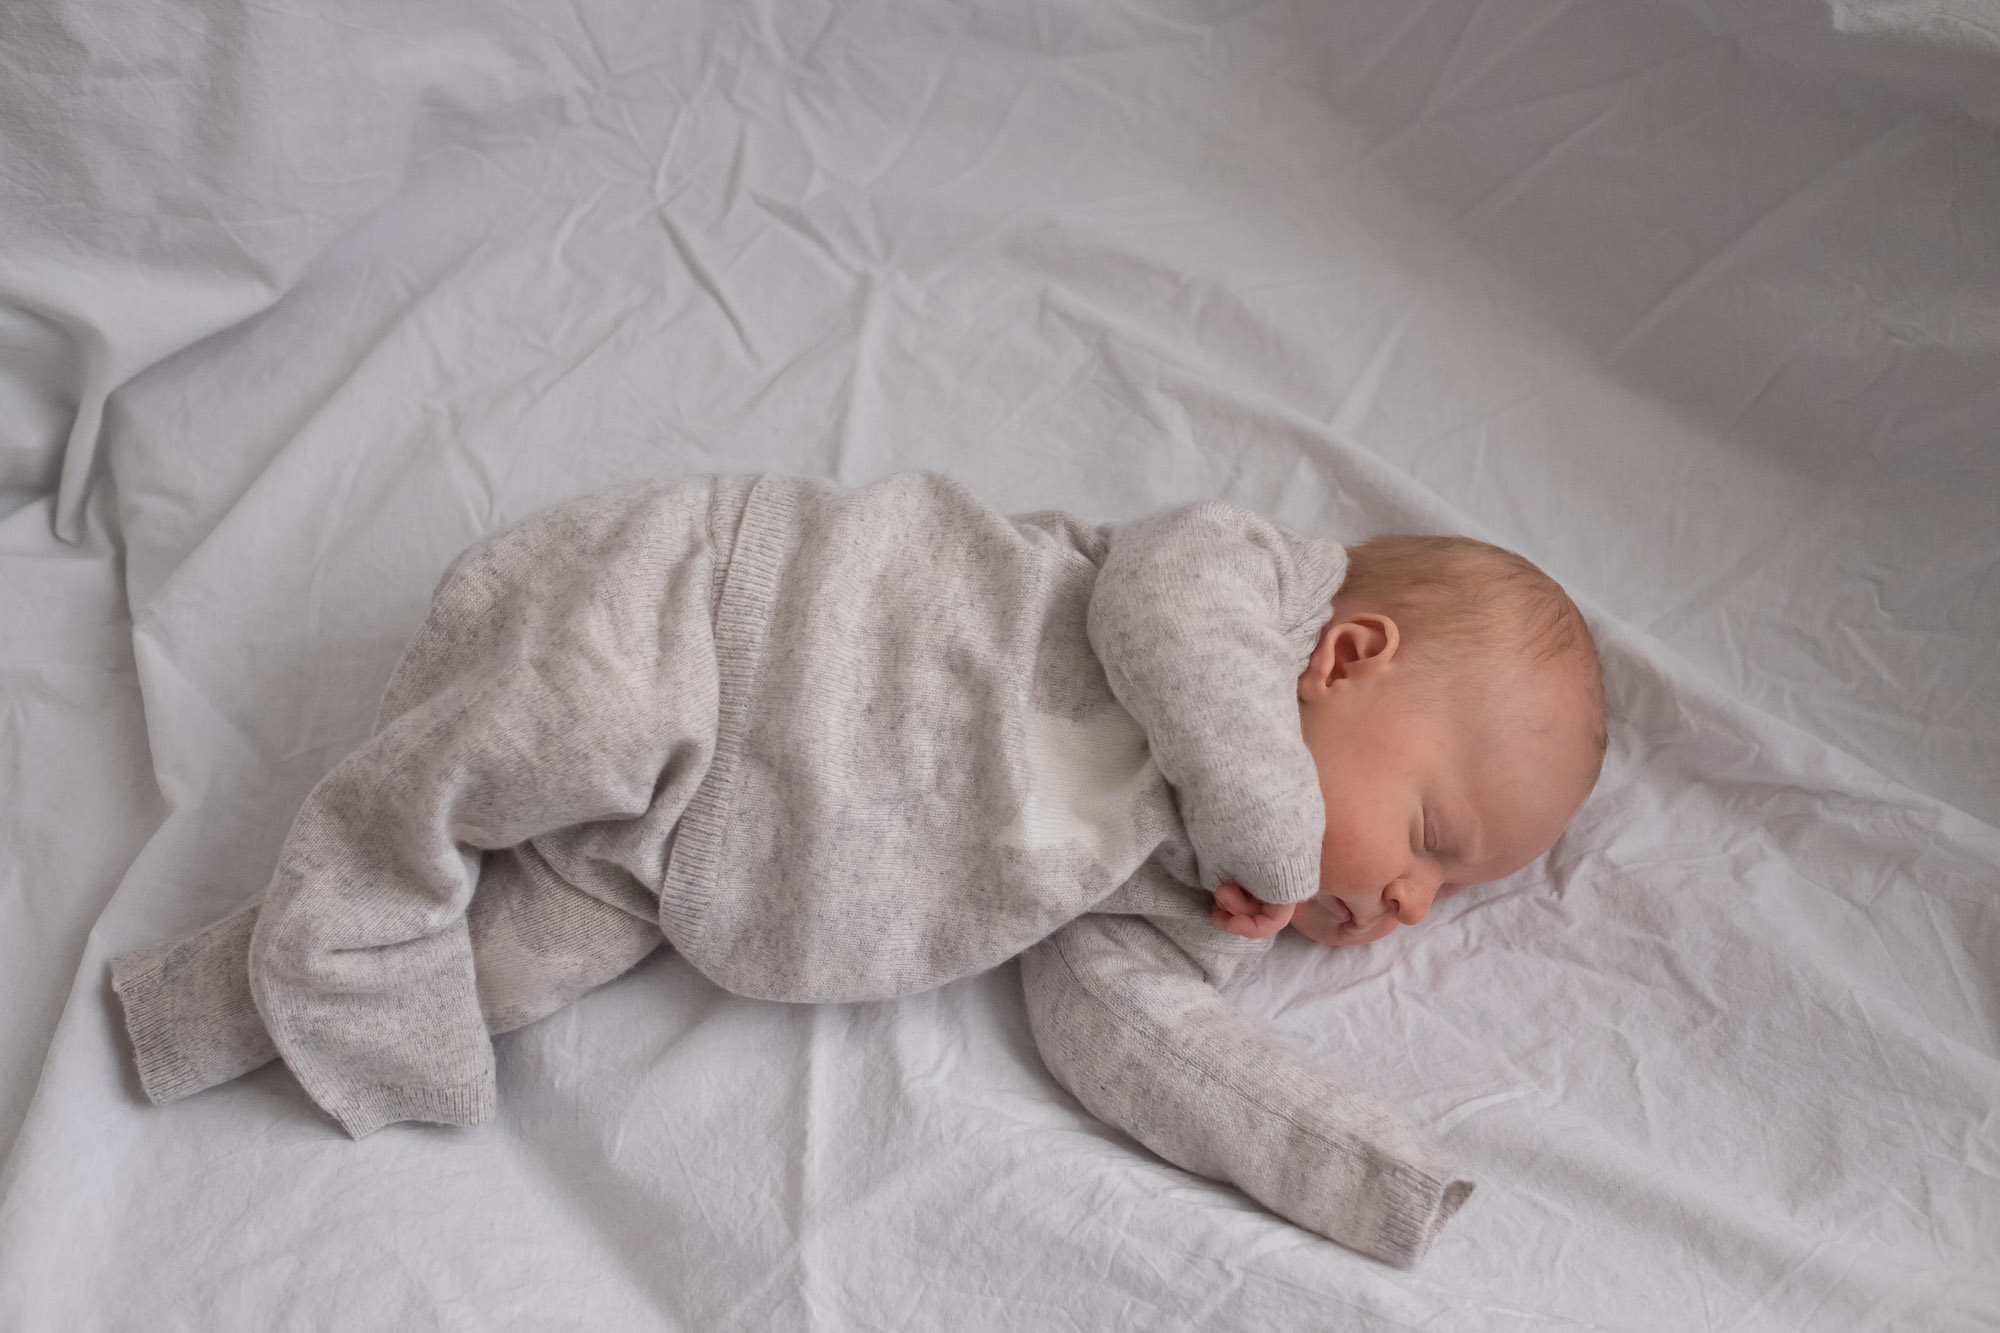 family-portrait-baby-photographer-149.jpg